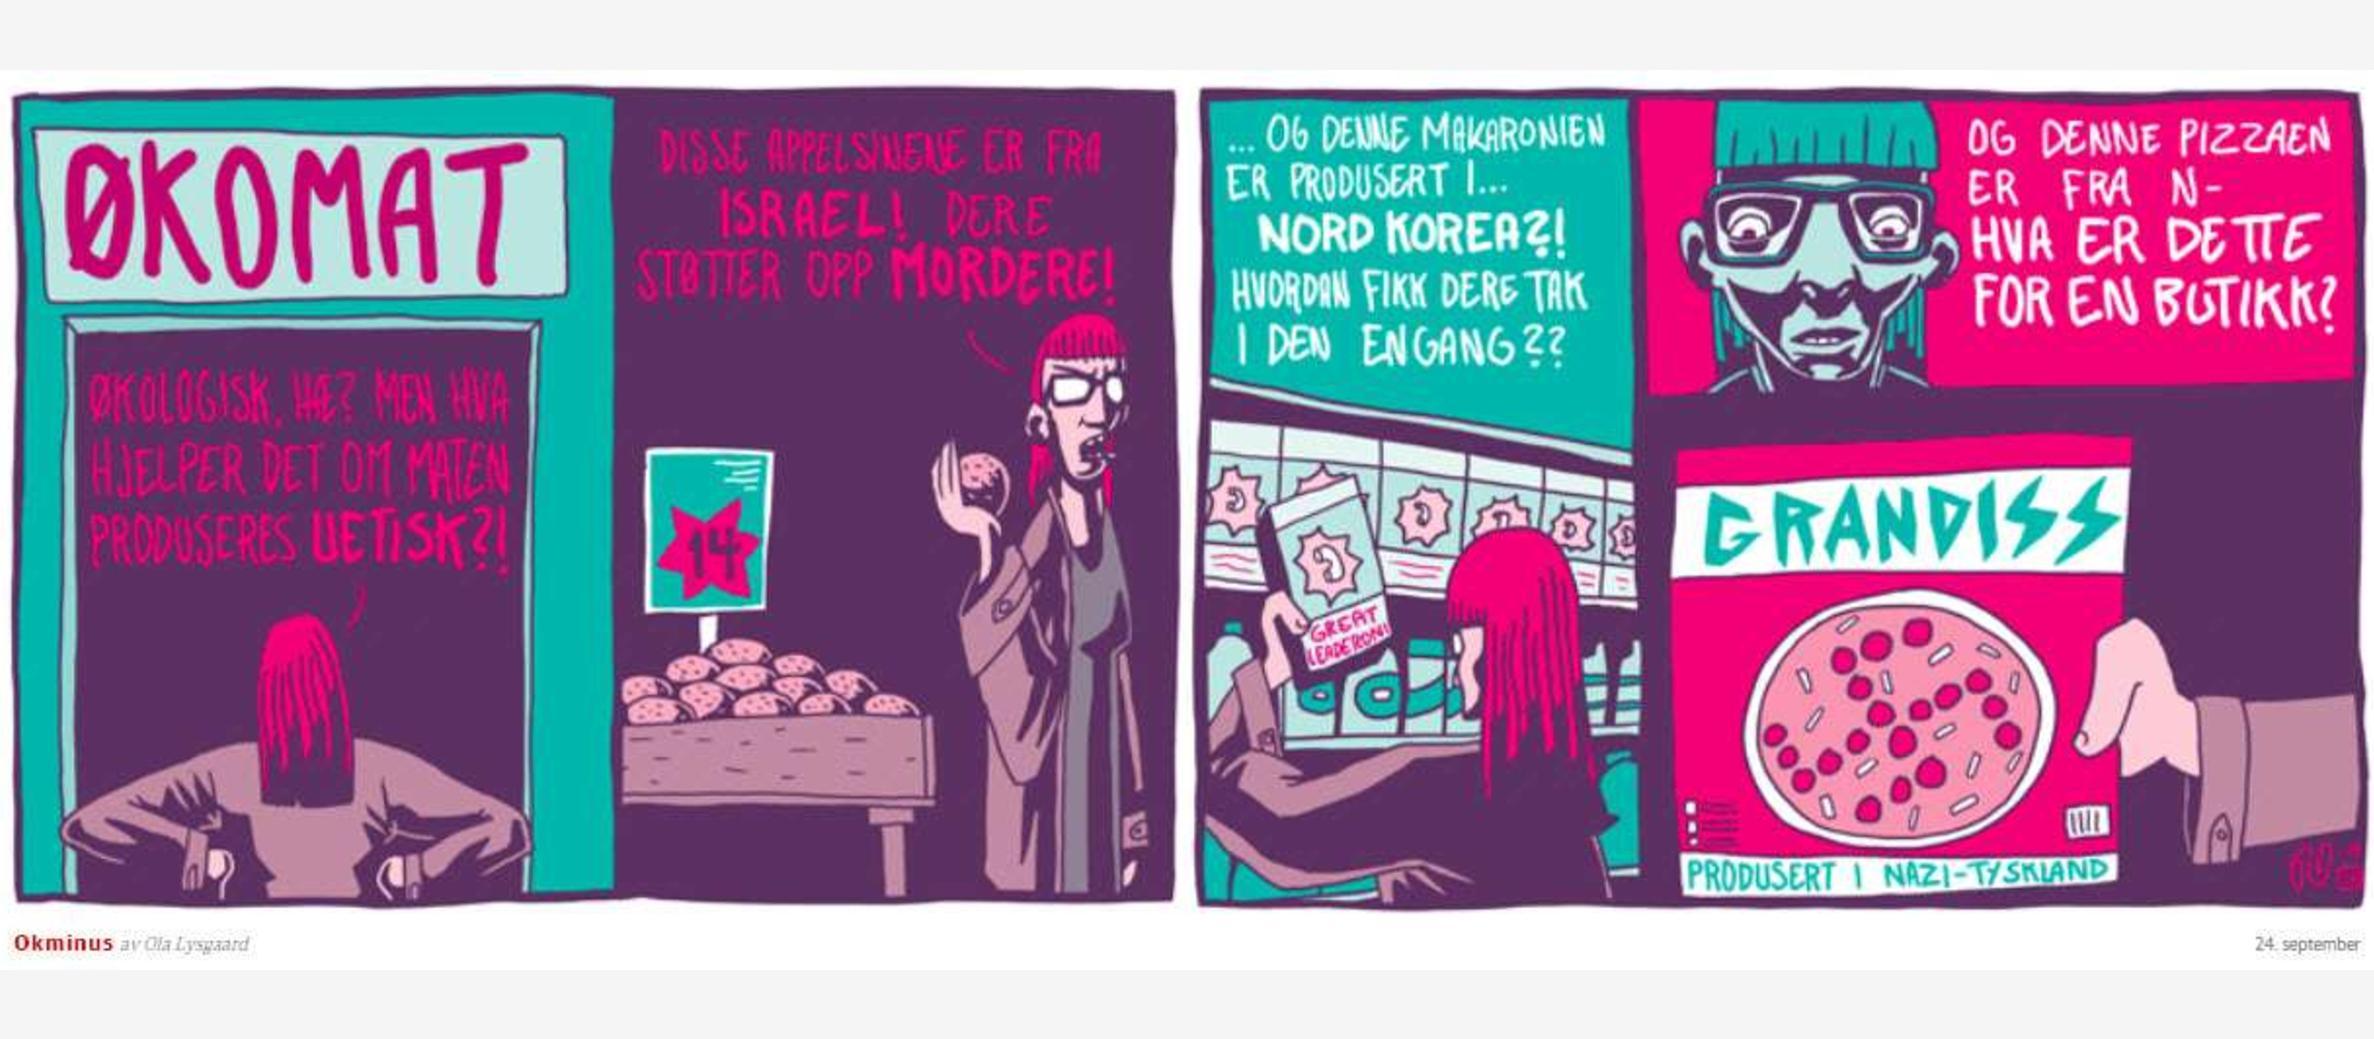 Norway: Newspaper comic strip likens Israel to Nazis and North Korea